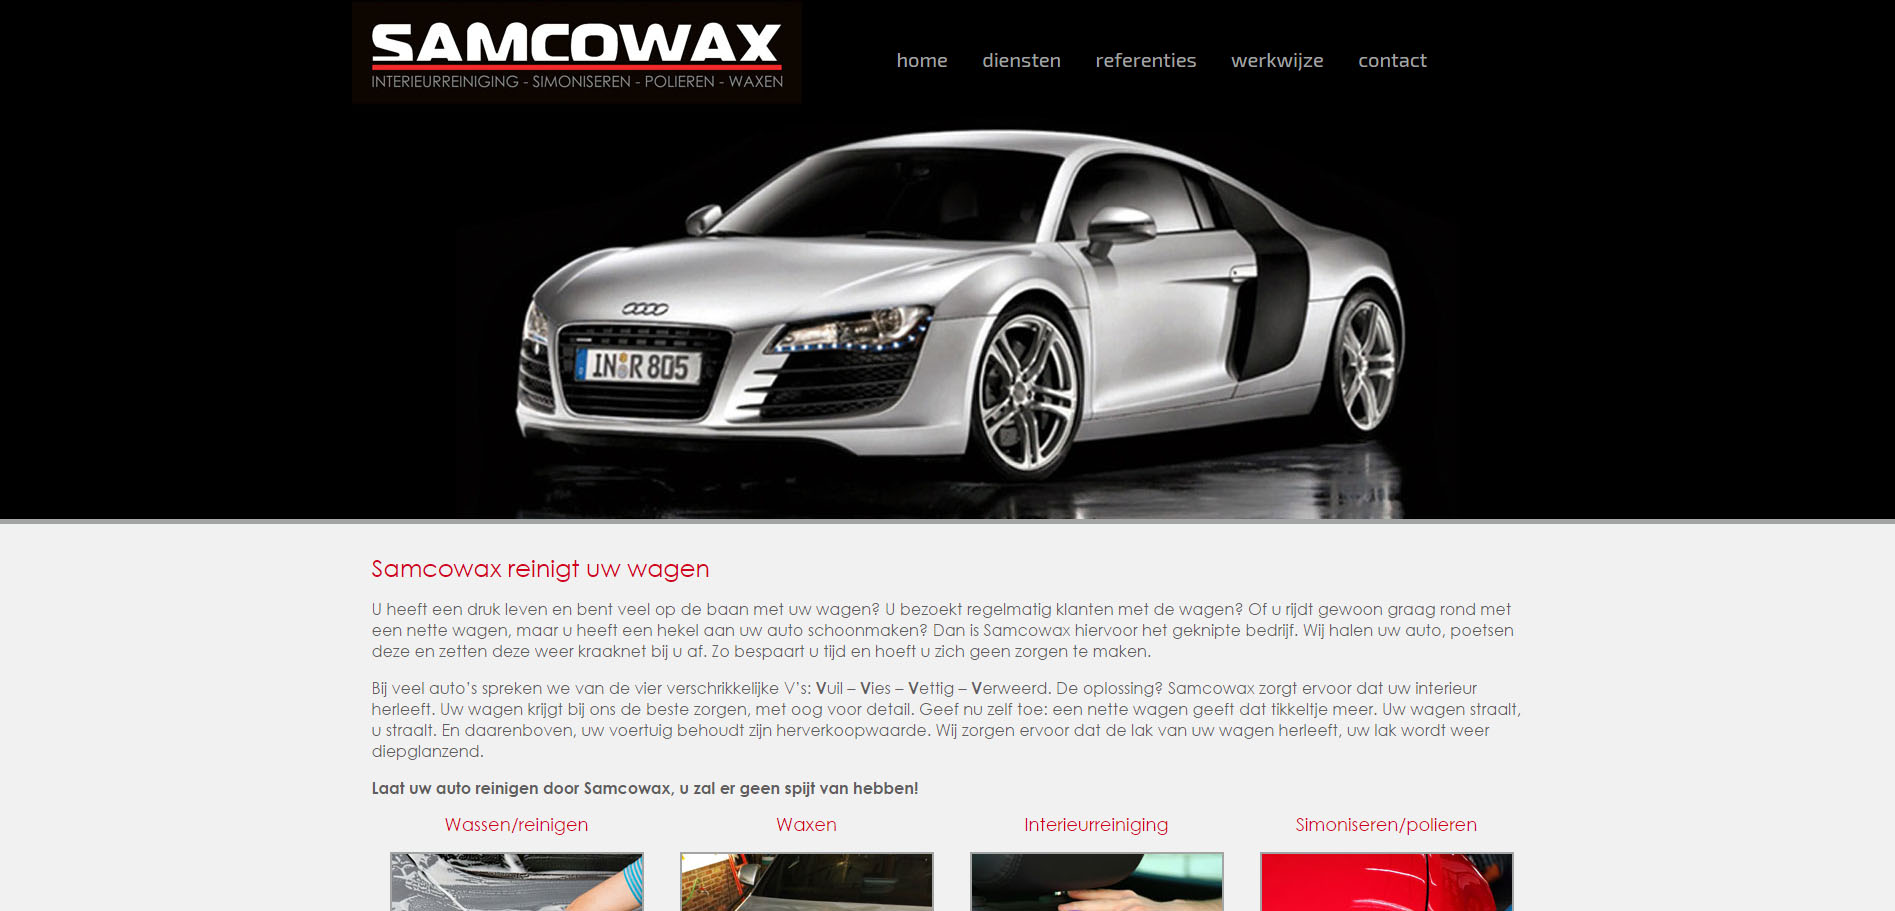 samcowax1